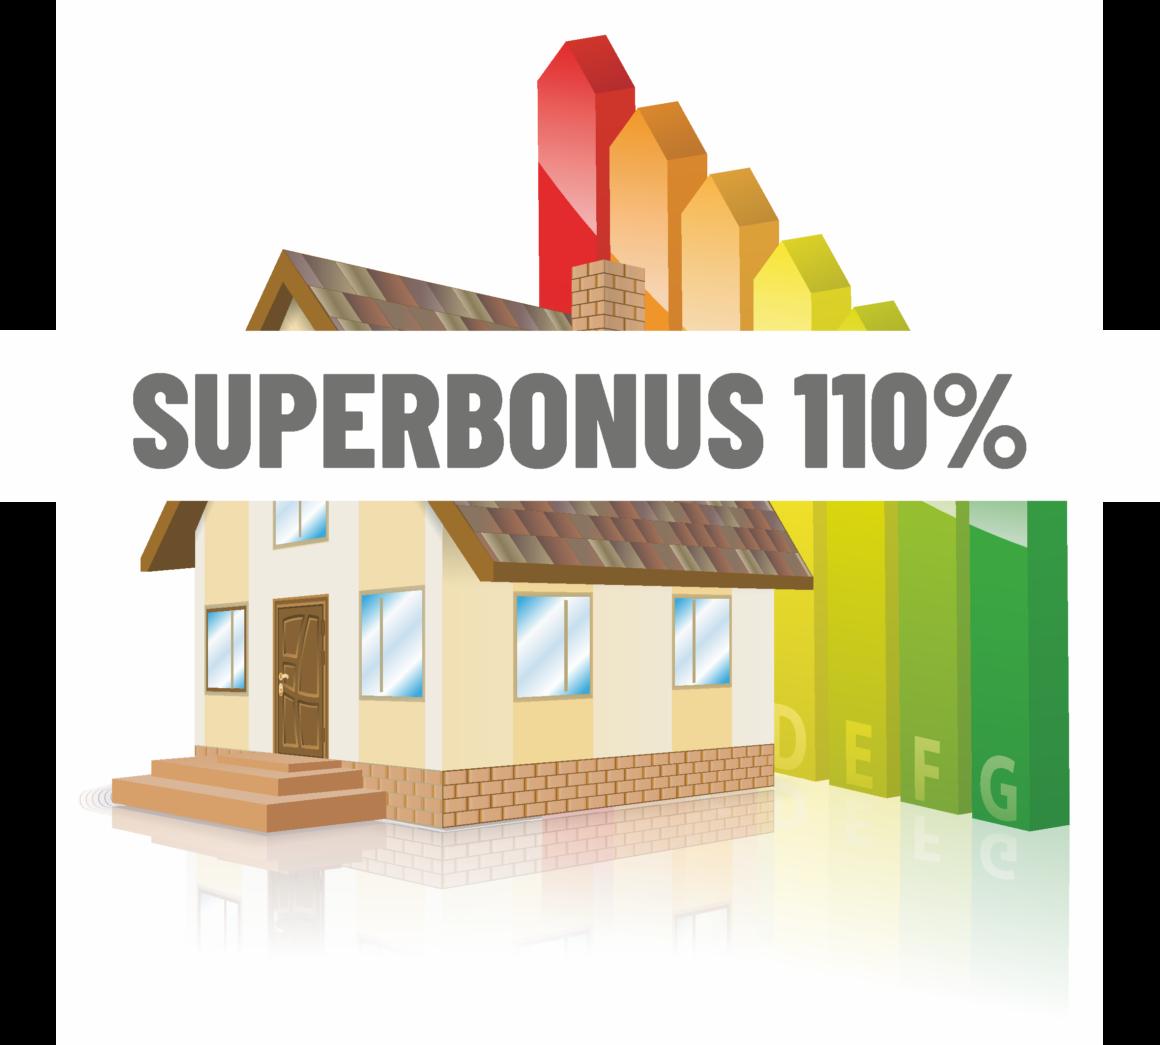 bonus 110%